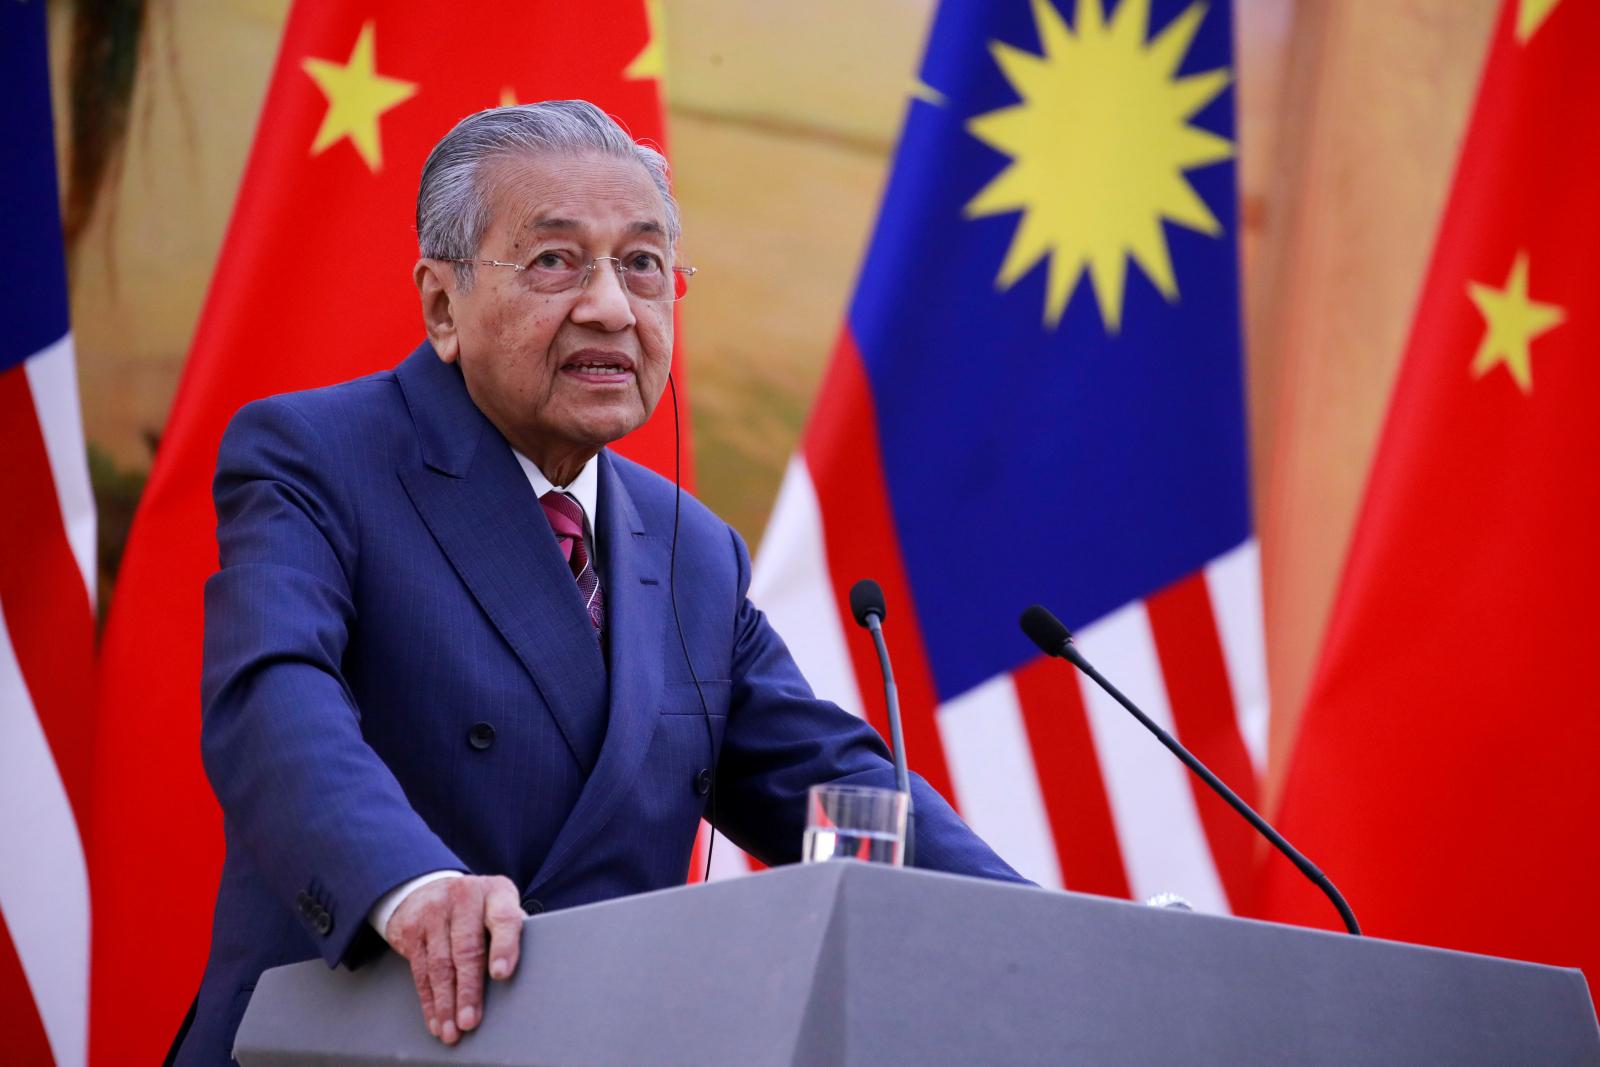 Prime Minister Mahathir Mohamad